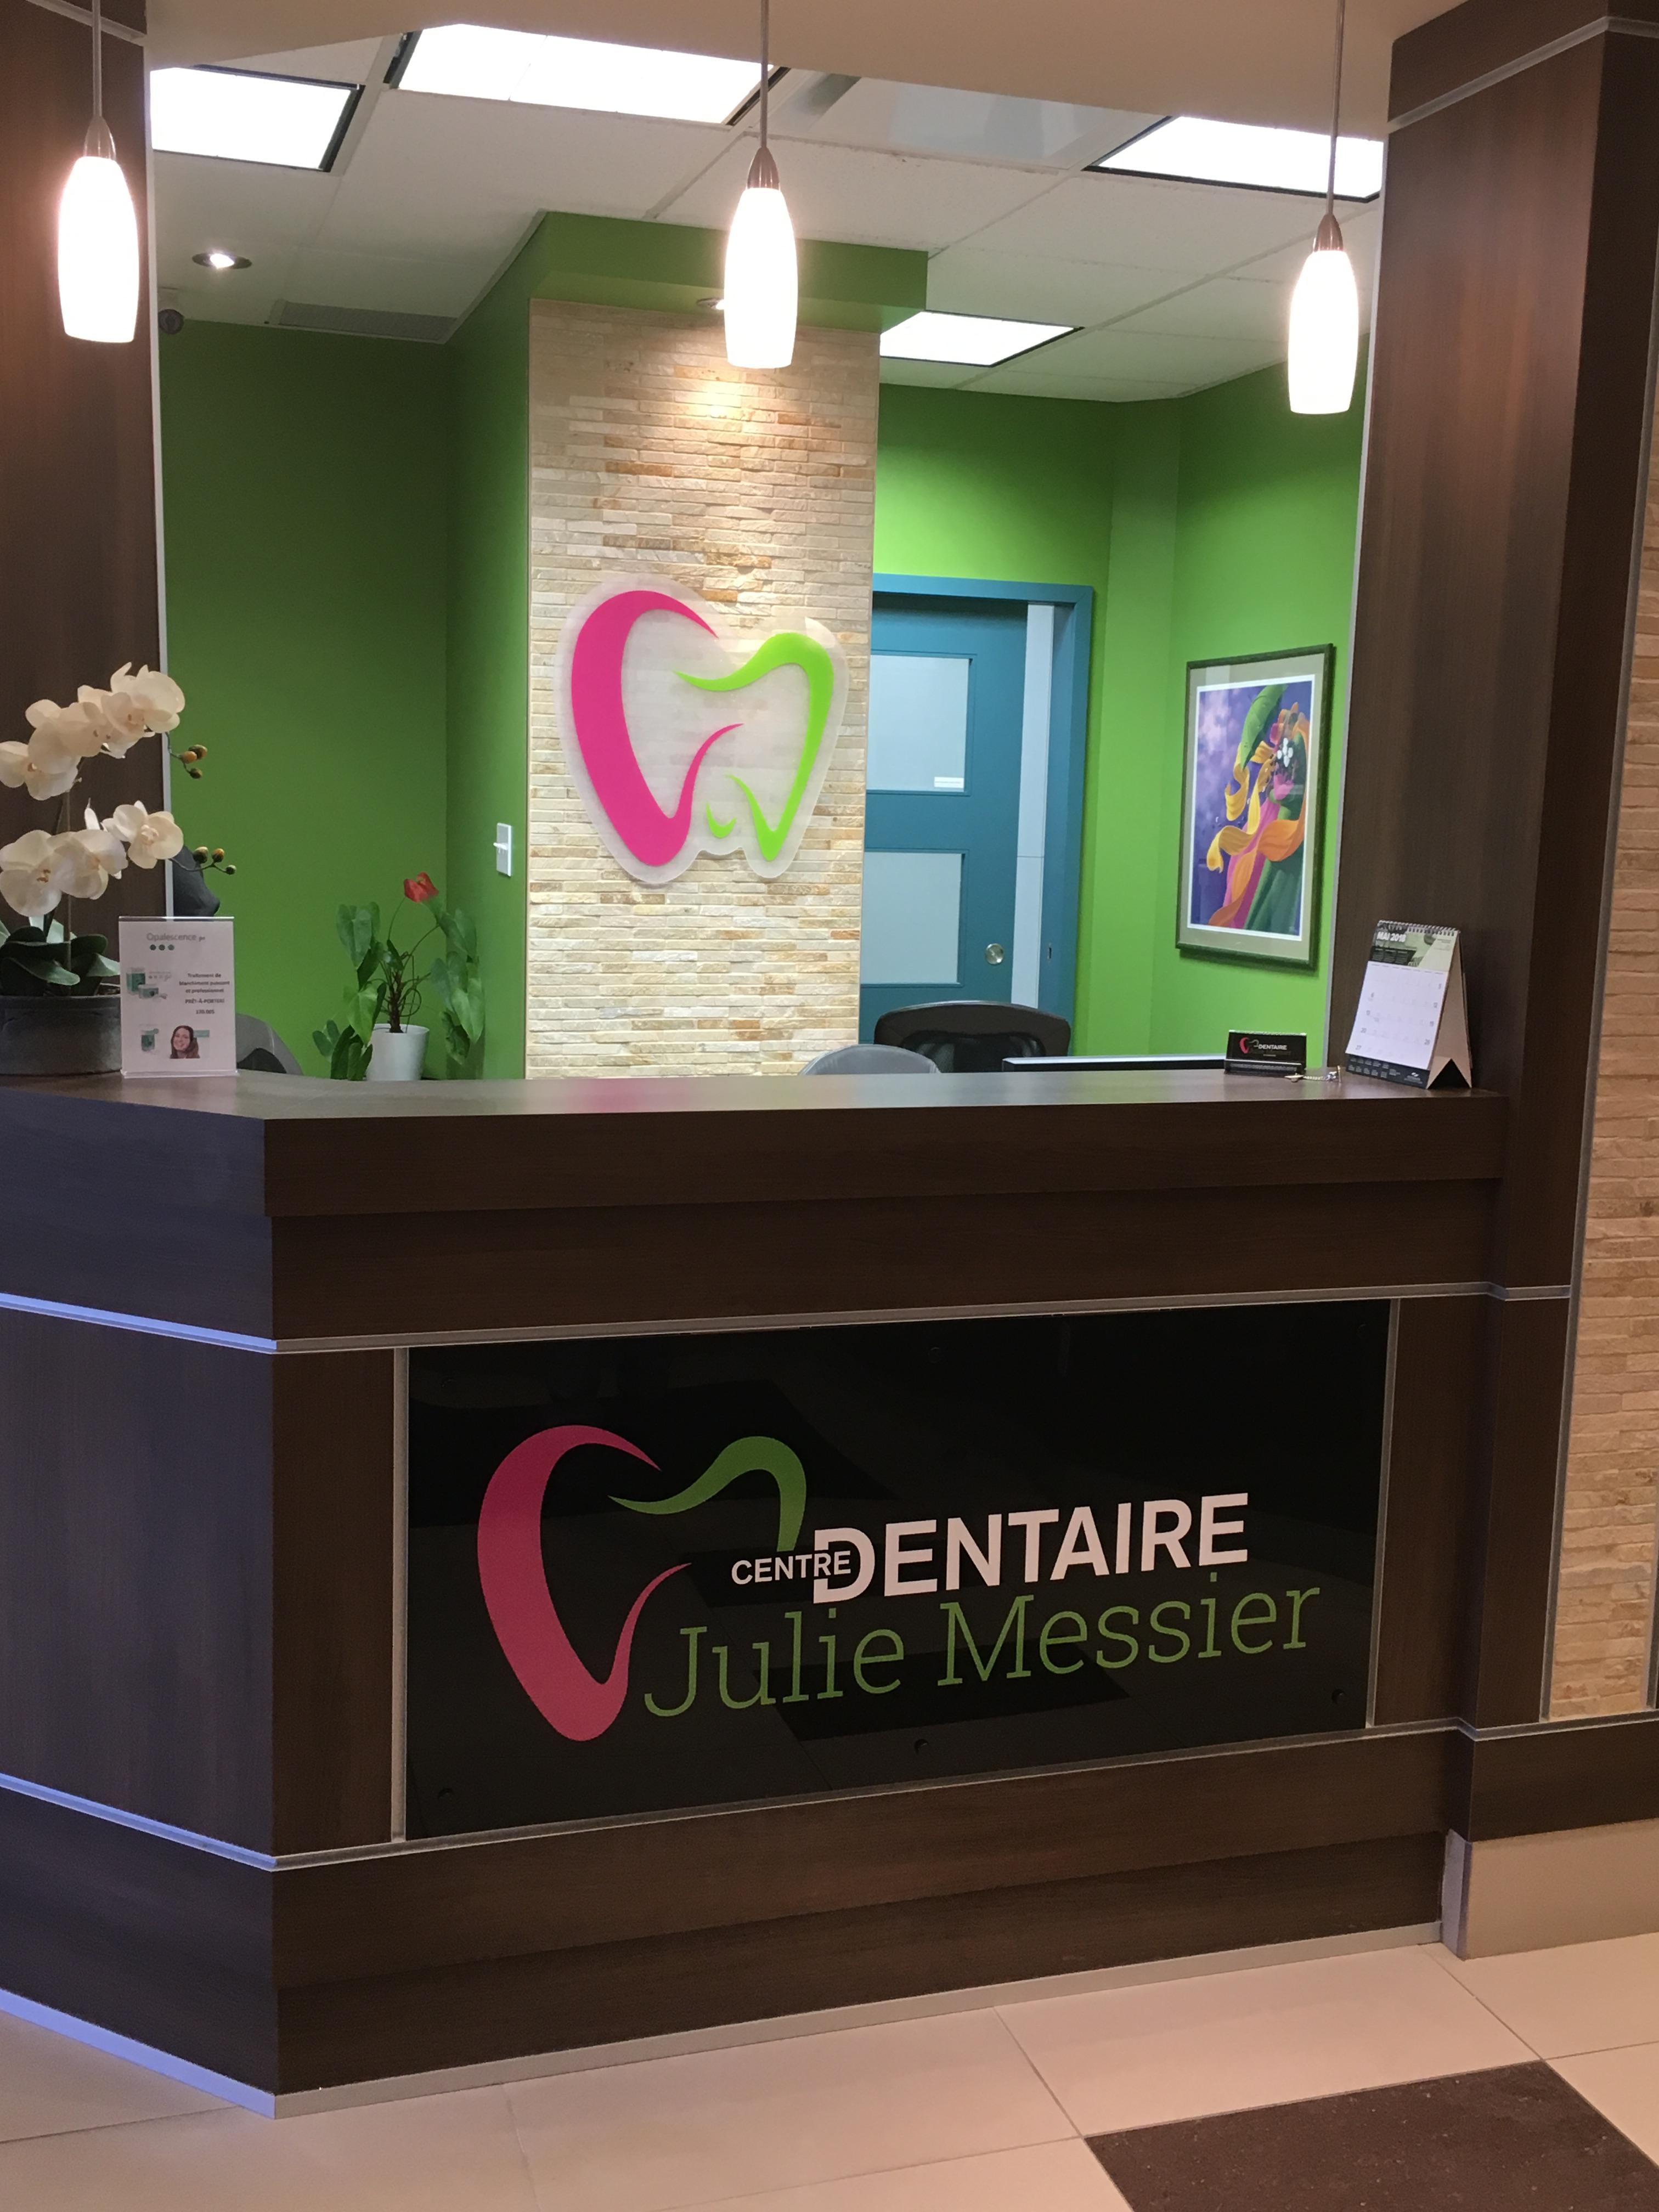 centre-dentaire-julie-messier-affichage-accueil